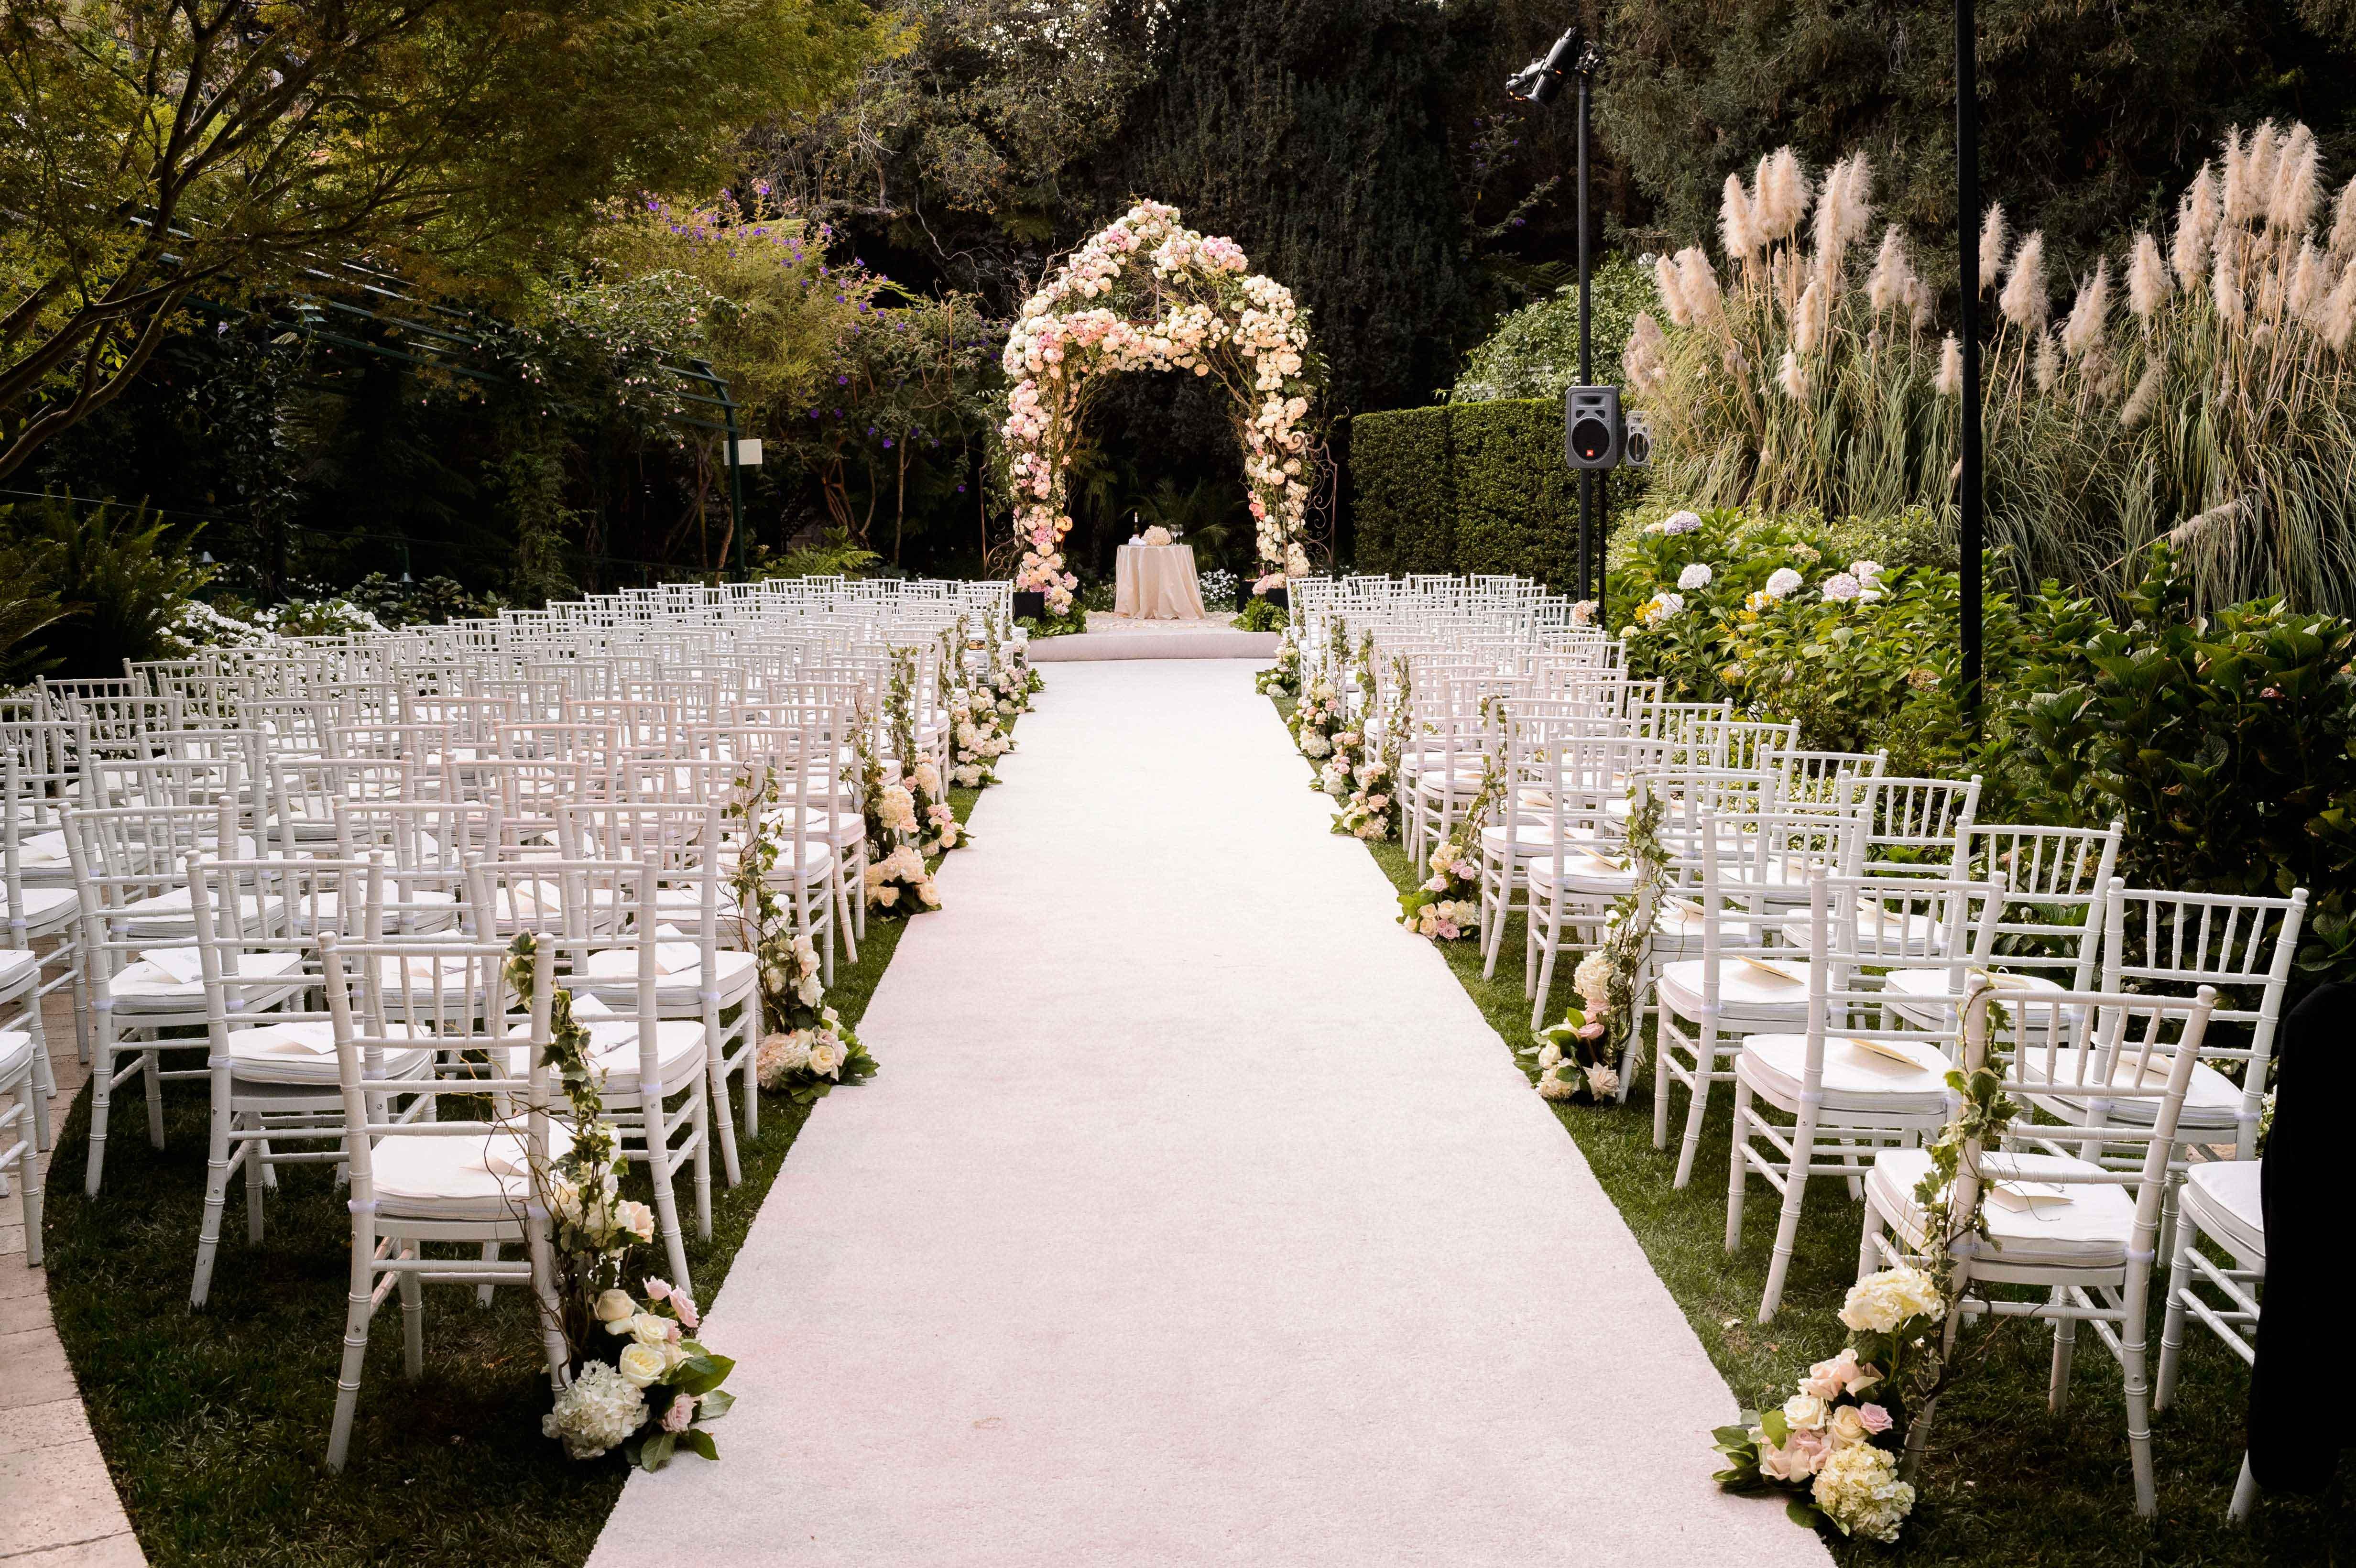 Garden wedding ceremony with flower chuppah